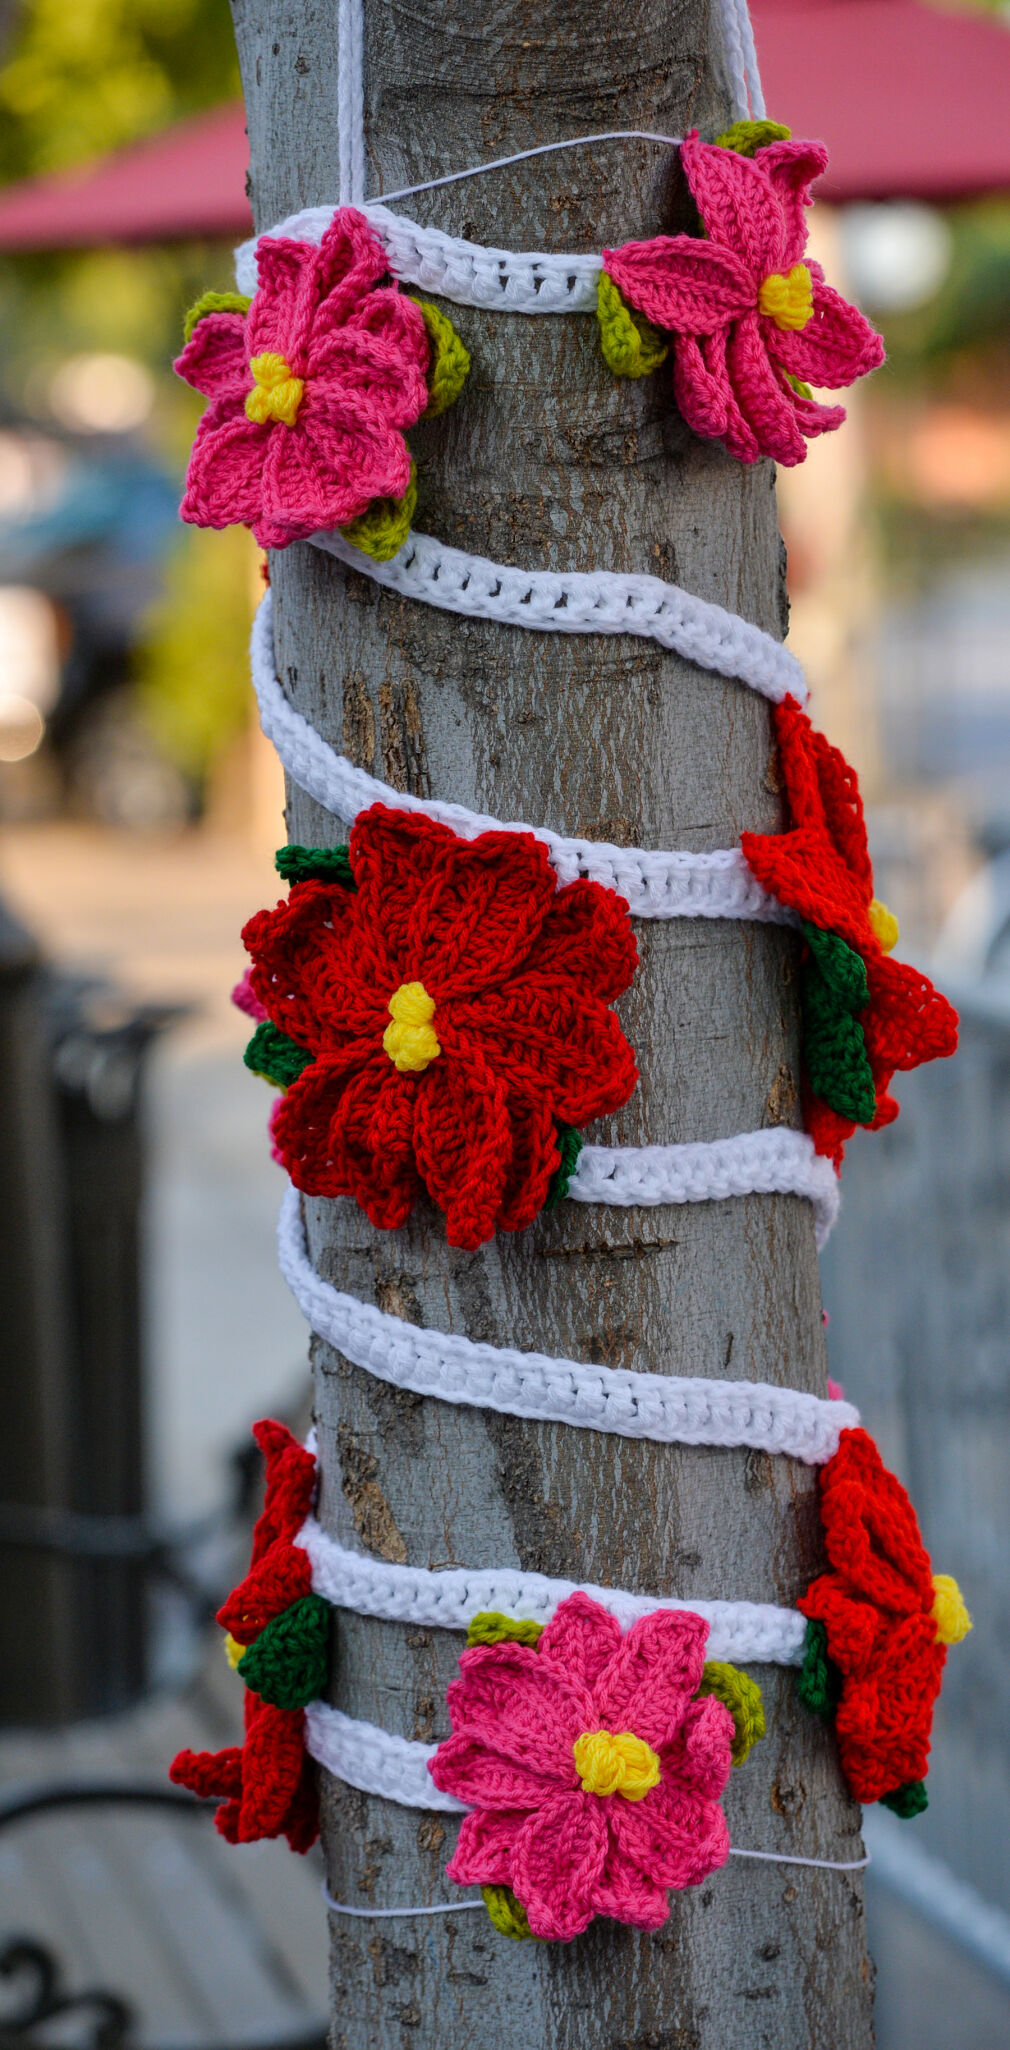 Tree Sweater  09-28-20 087